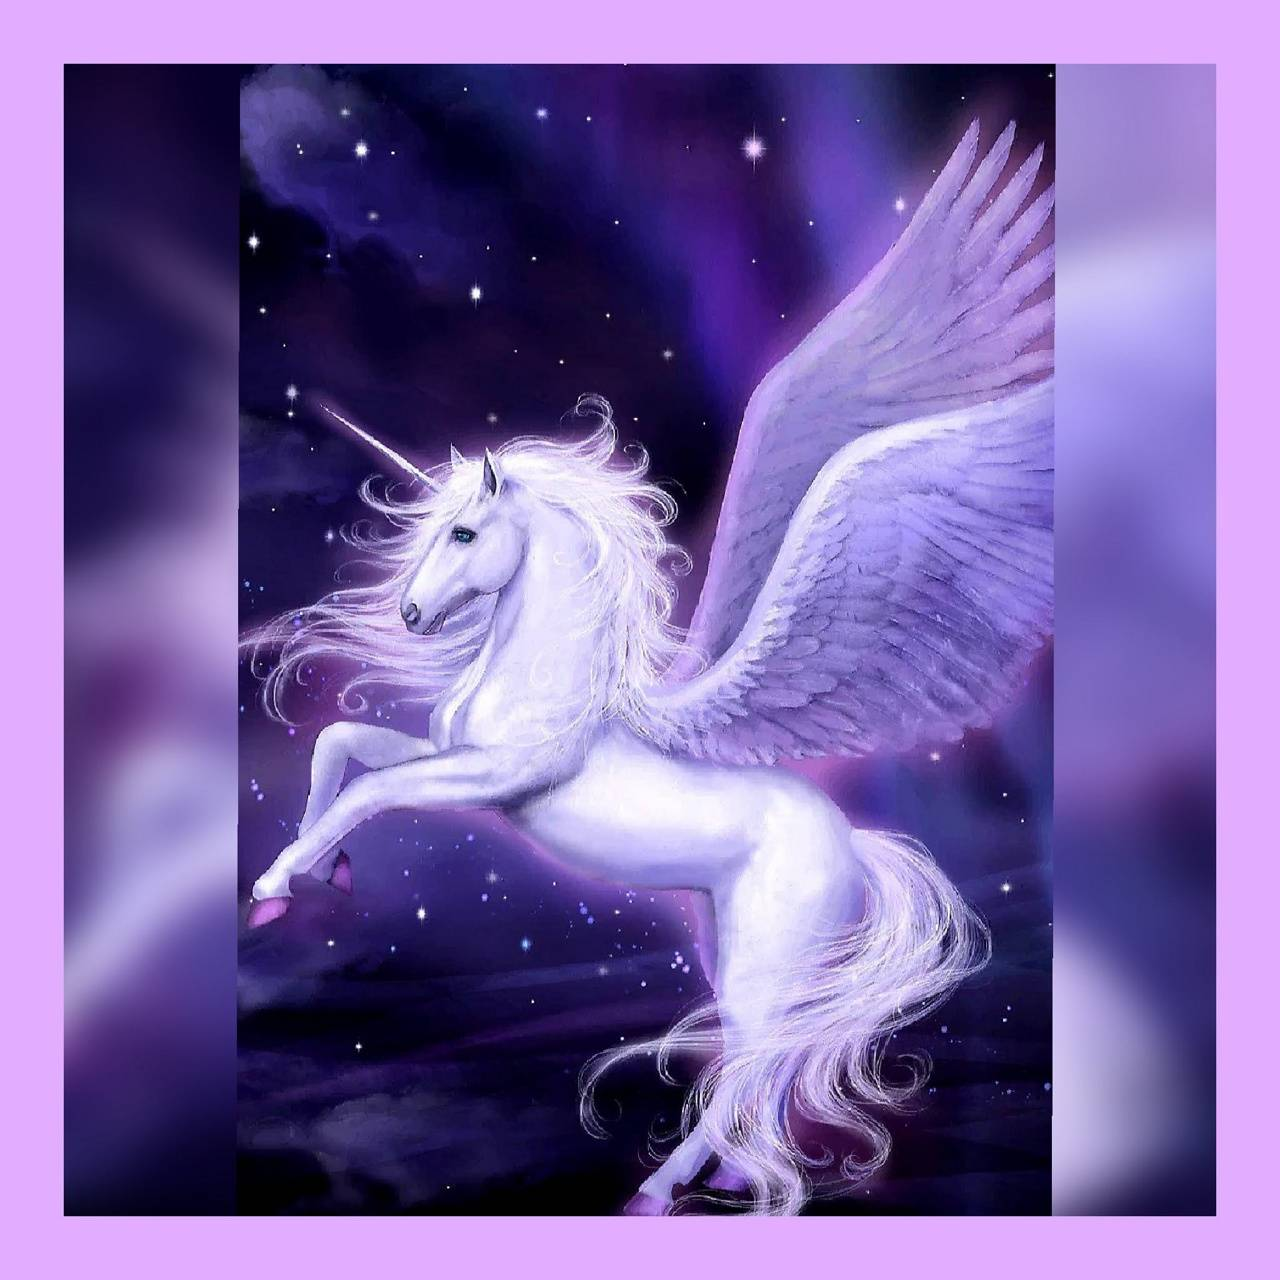 Fantasy unicorns